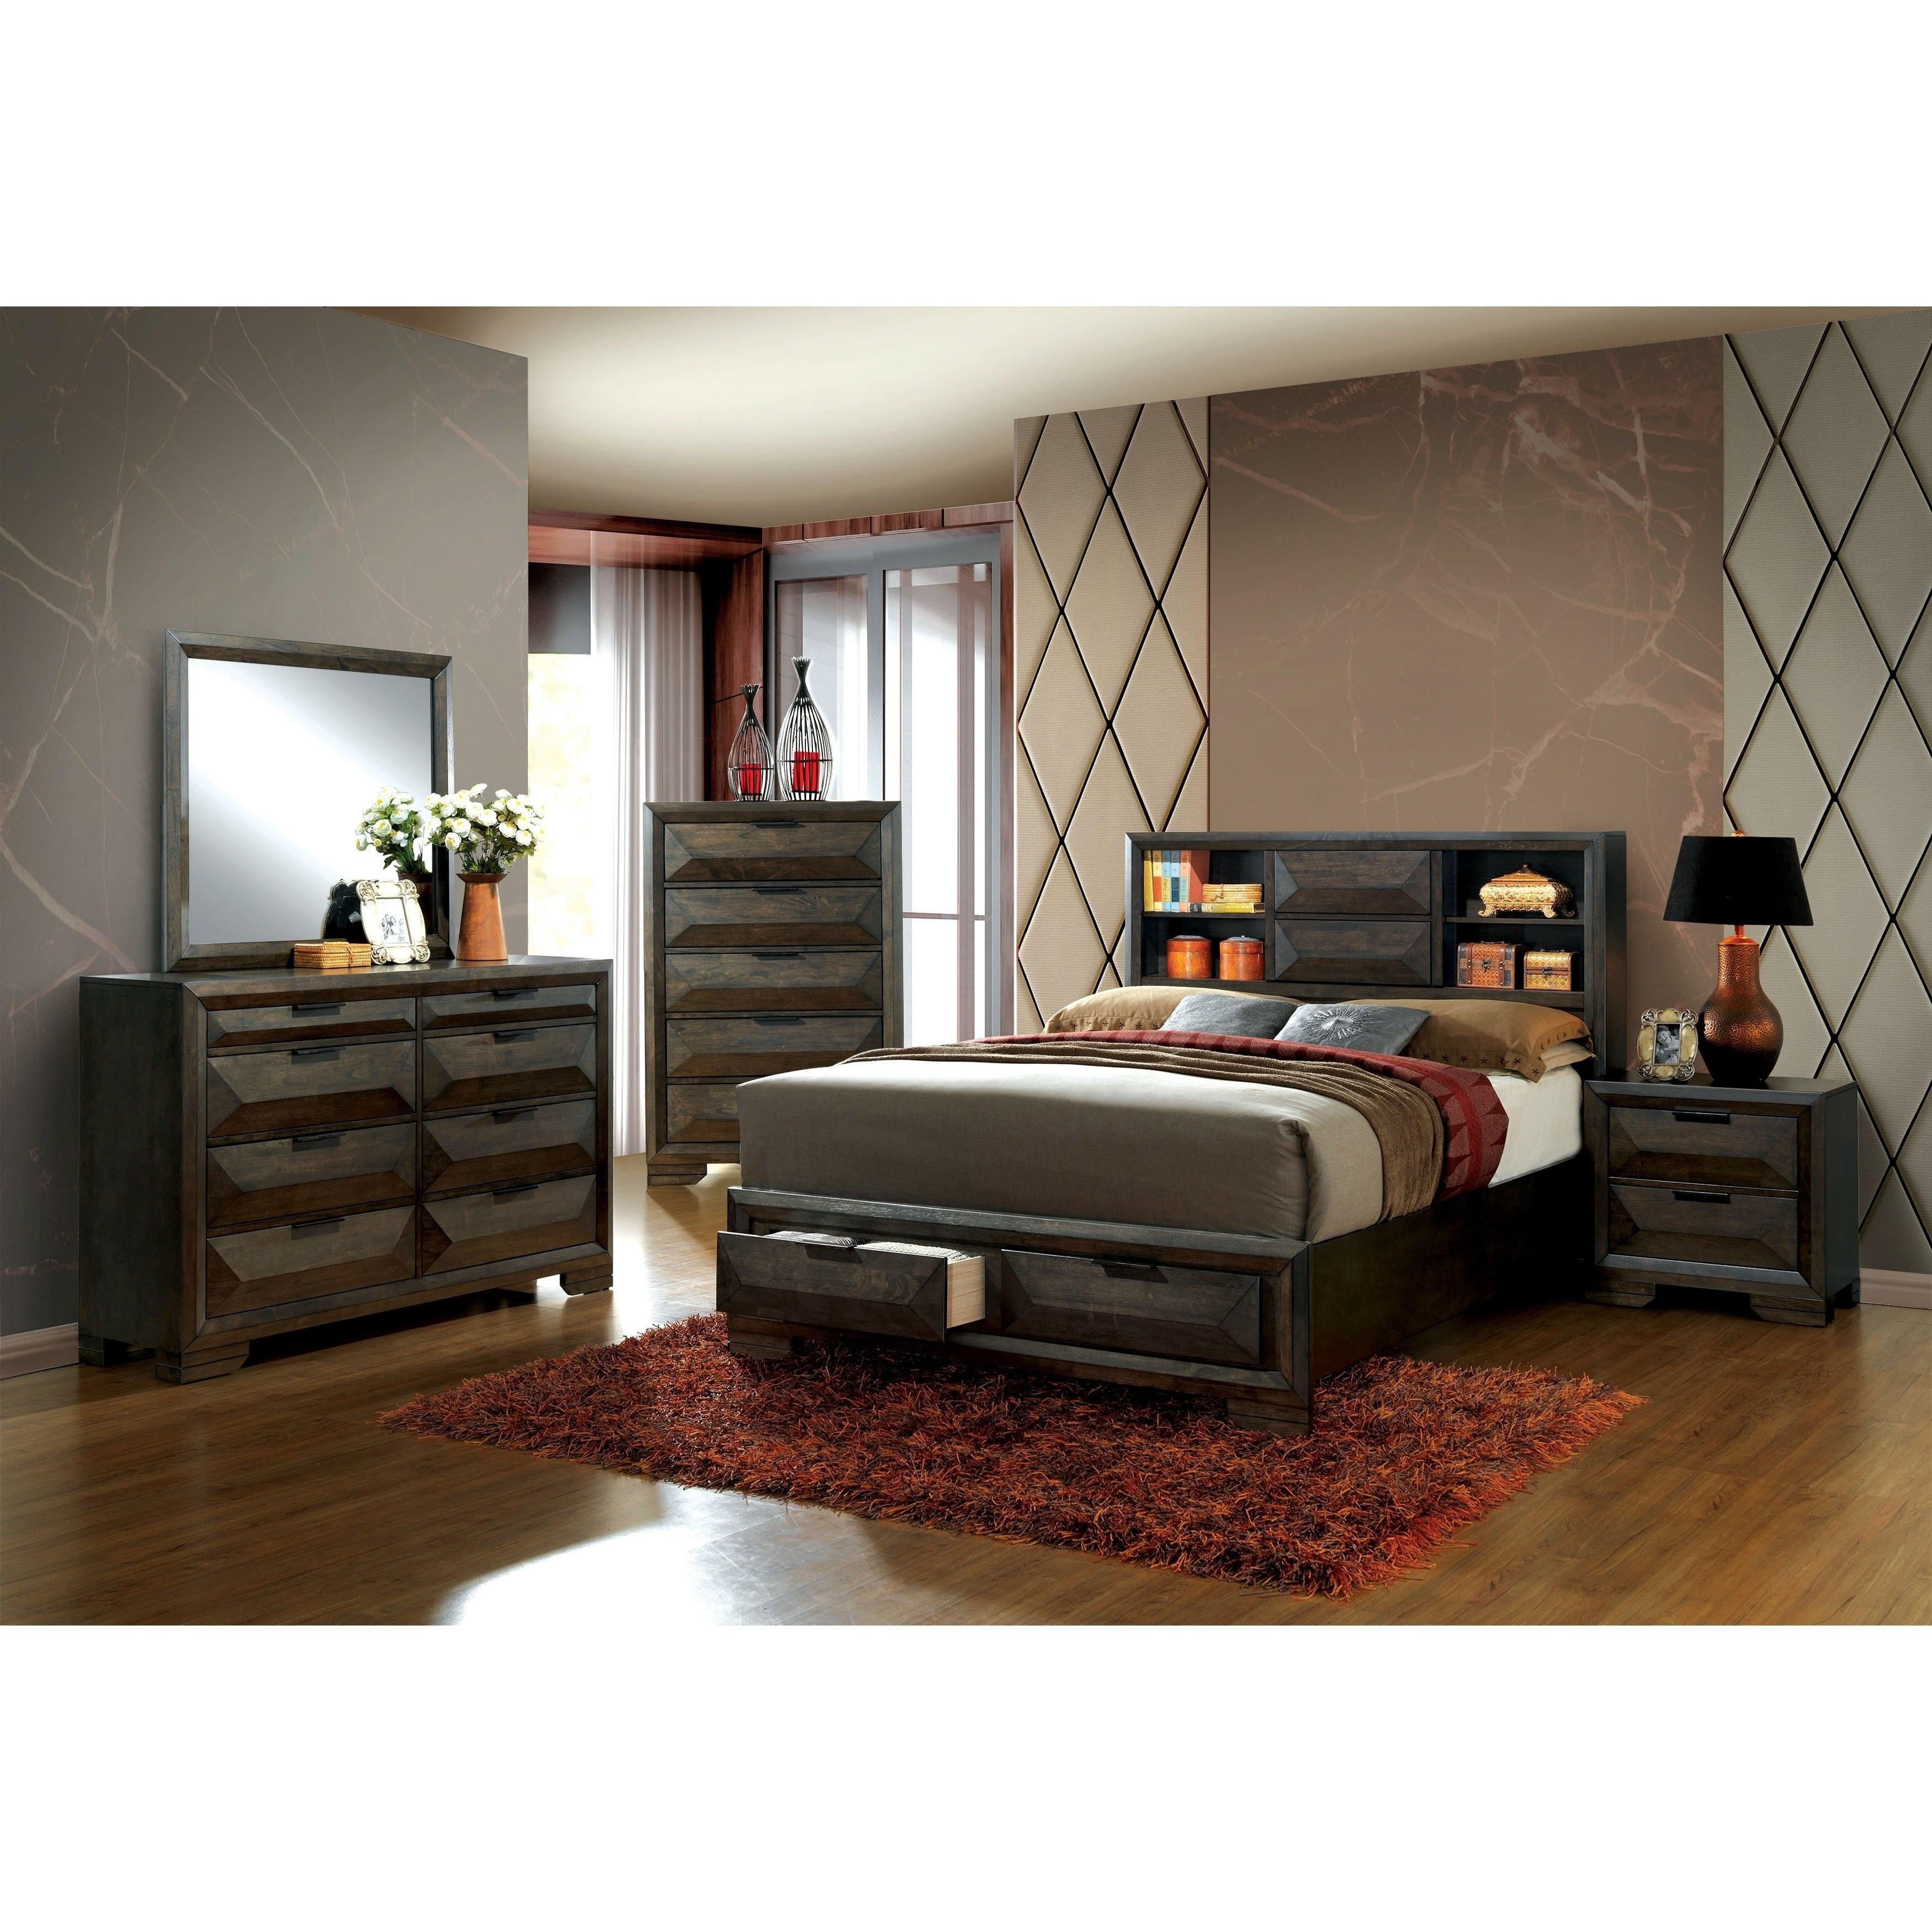 Superbe Stayven Contemporary Espresso Bookcase Headboard 4 Piece Bedroom Set